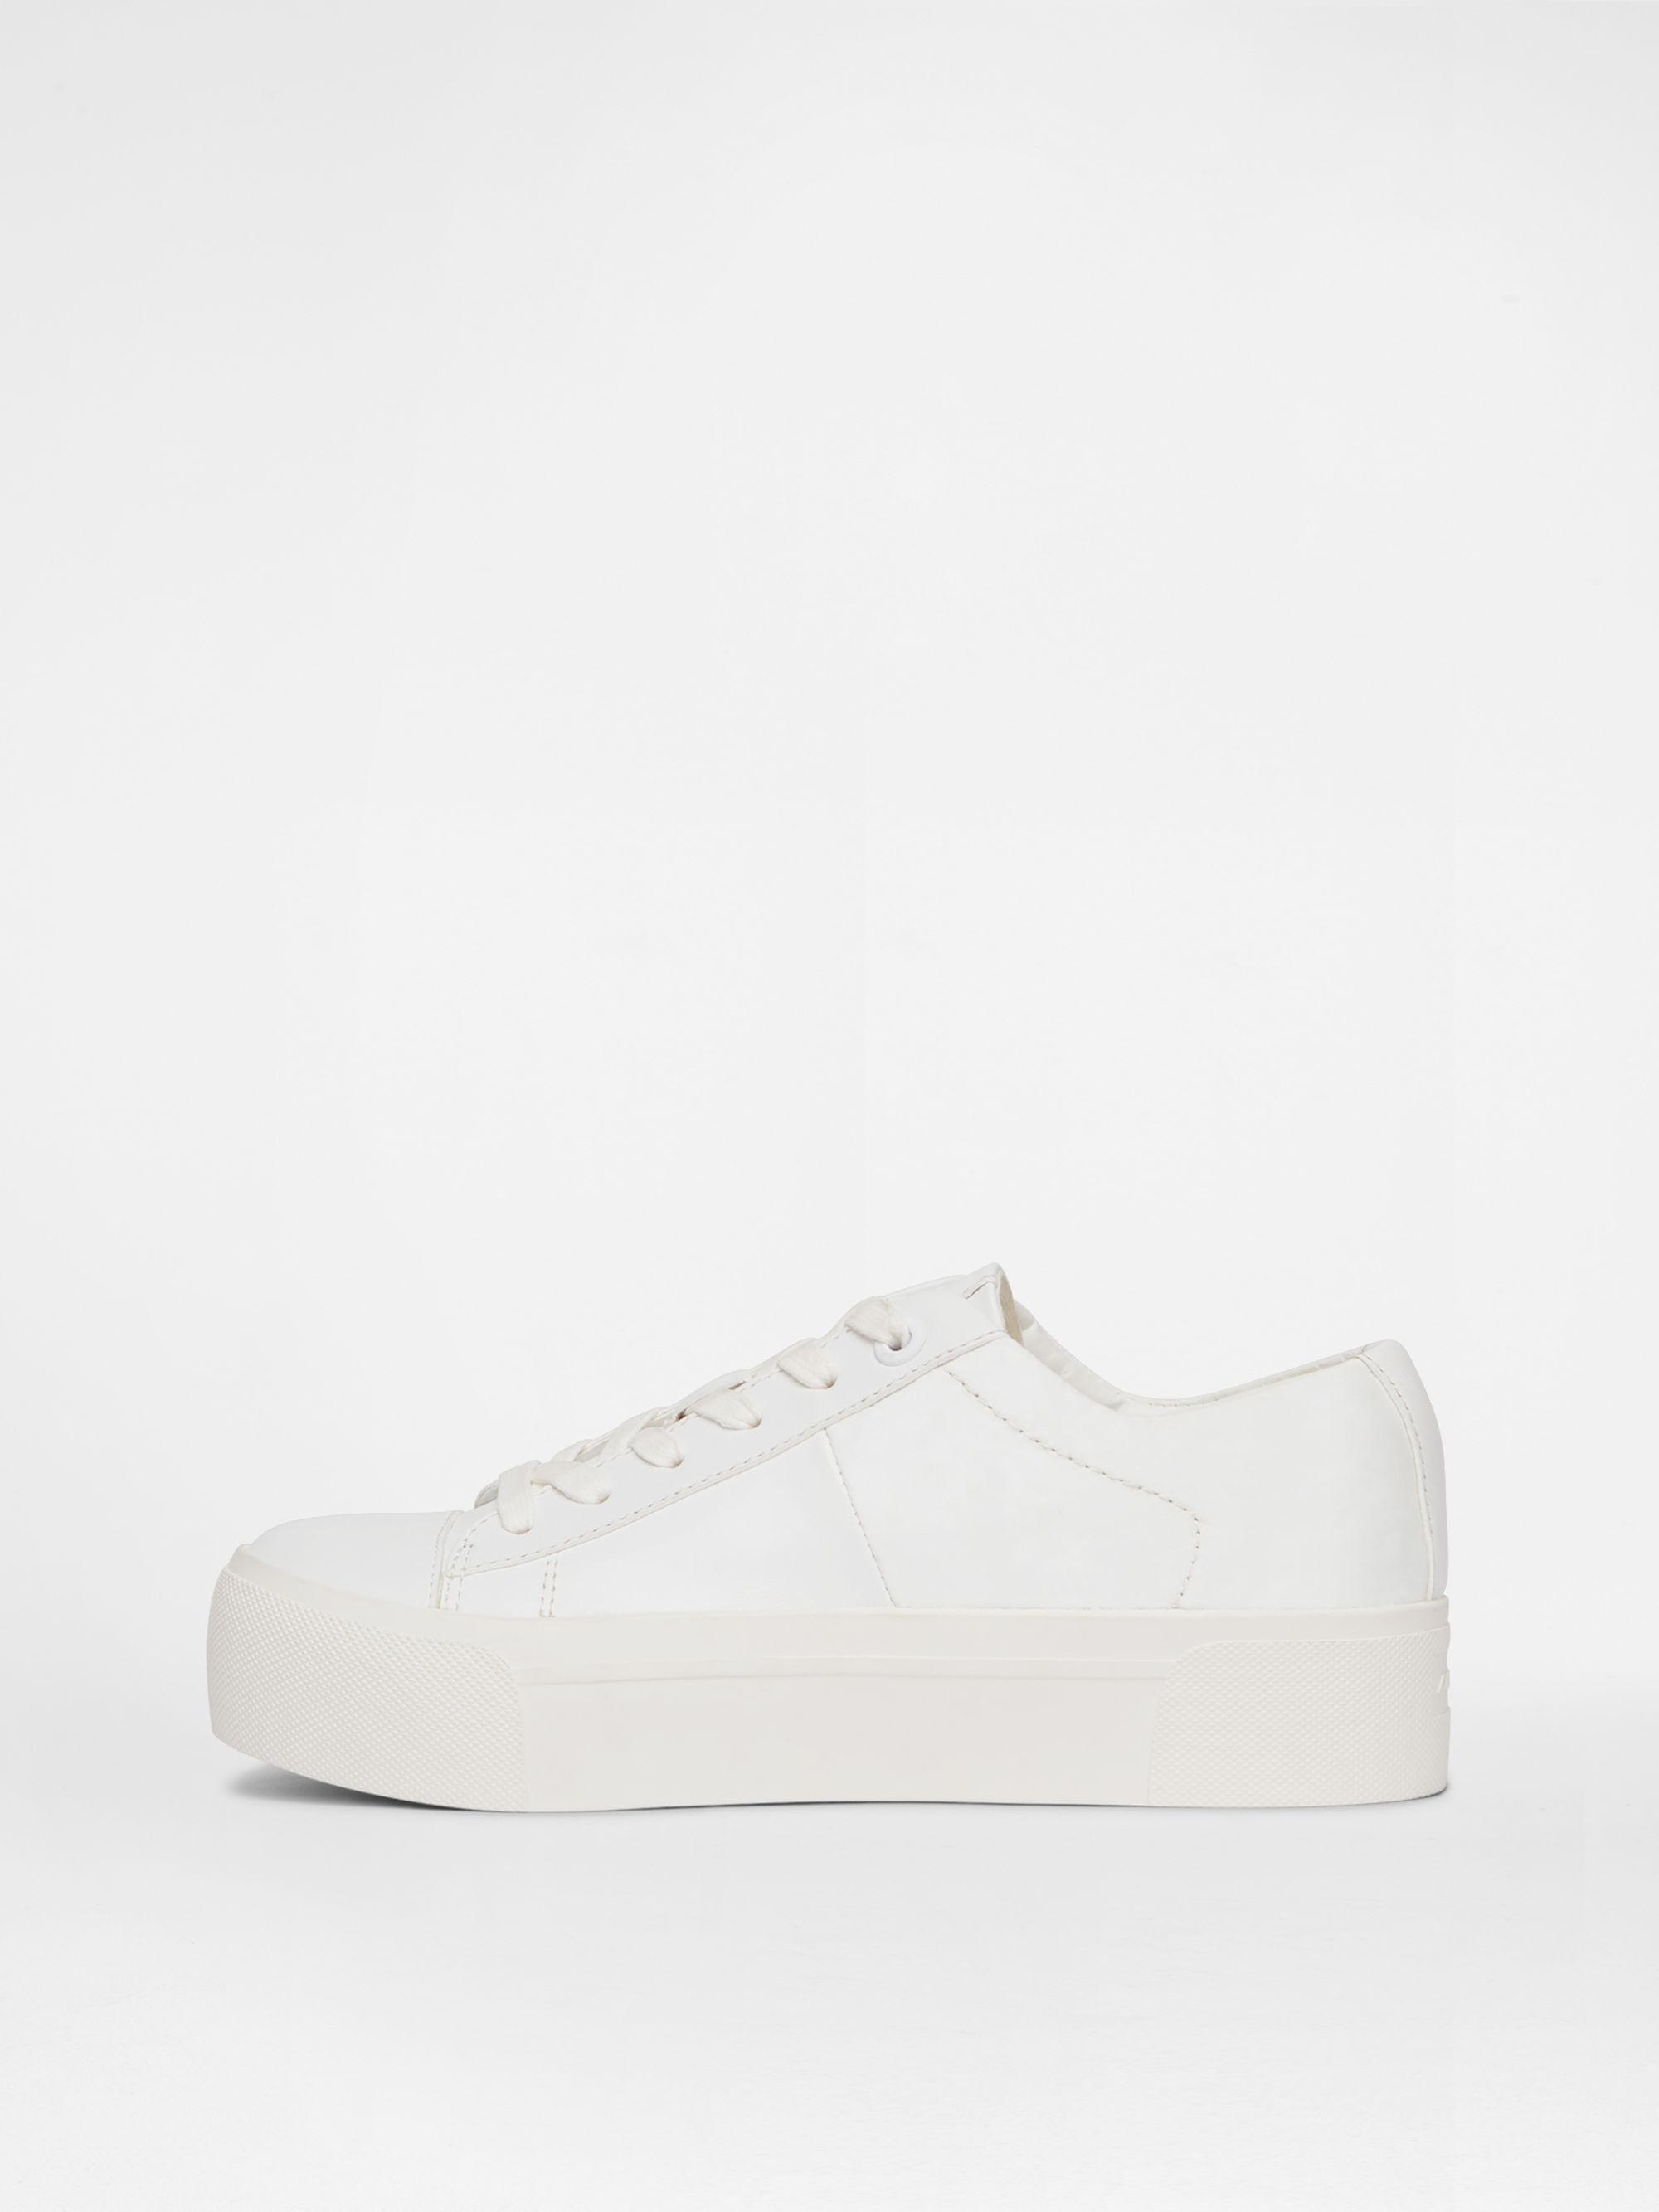 7b32a5d0484 Lyst - DKNY Bari Platform Sneaker in White